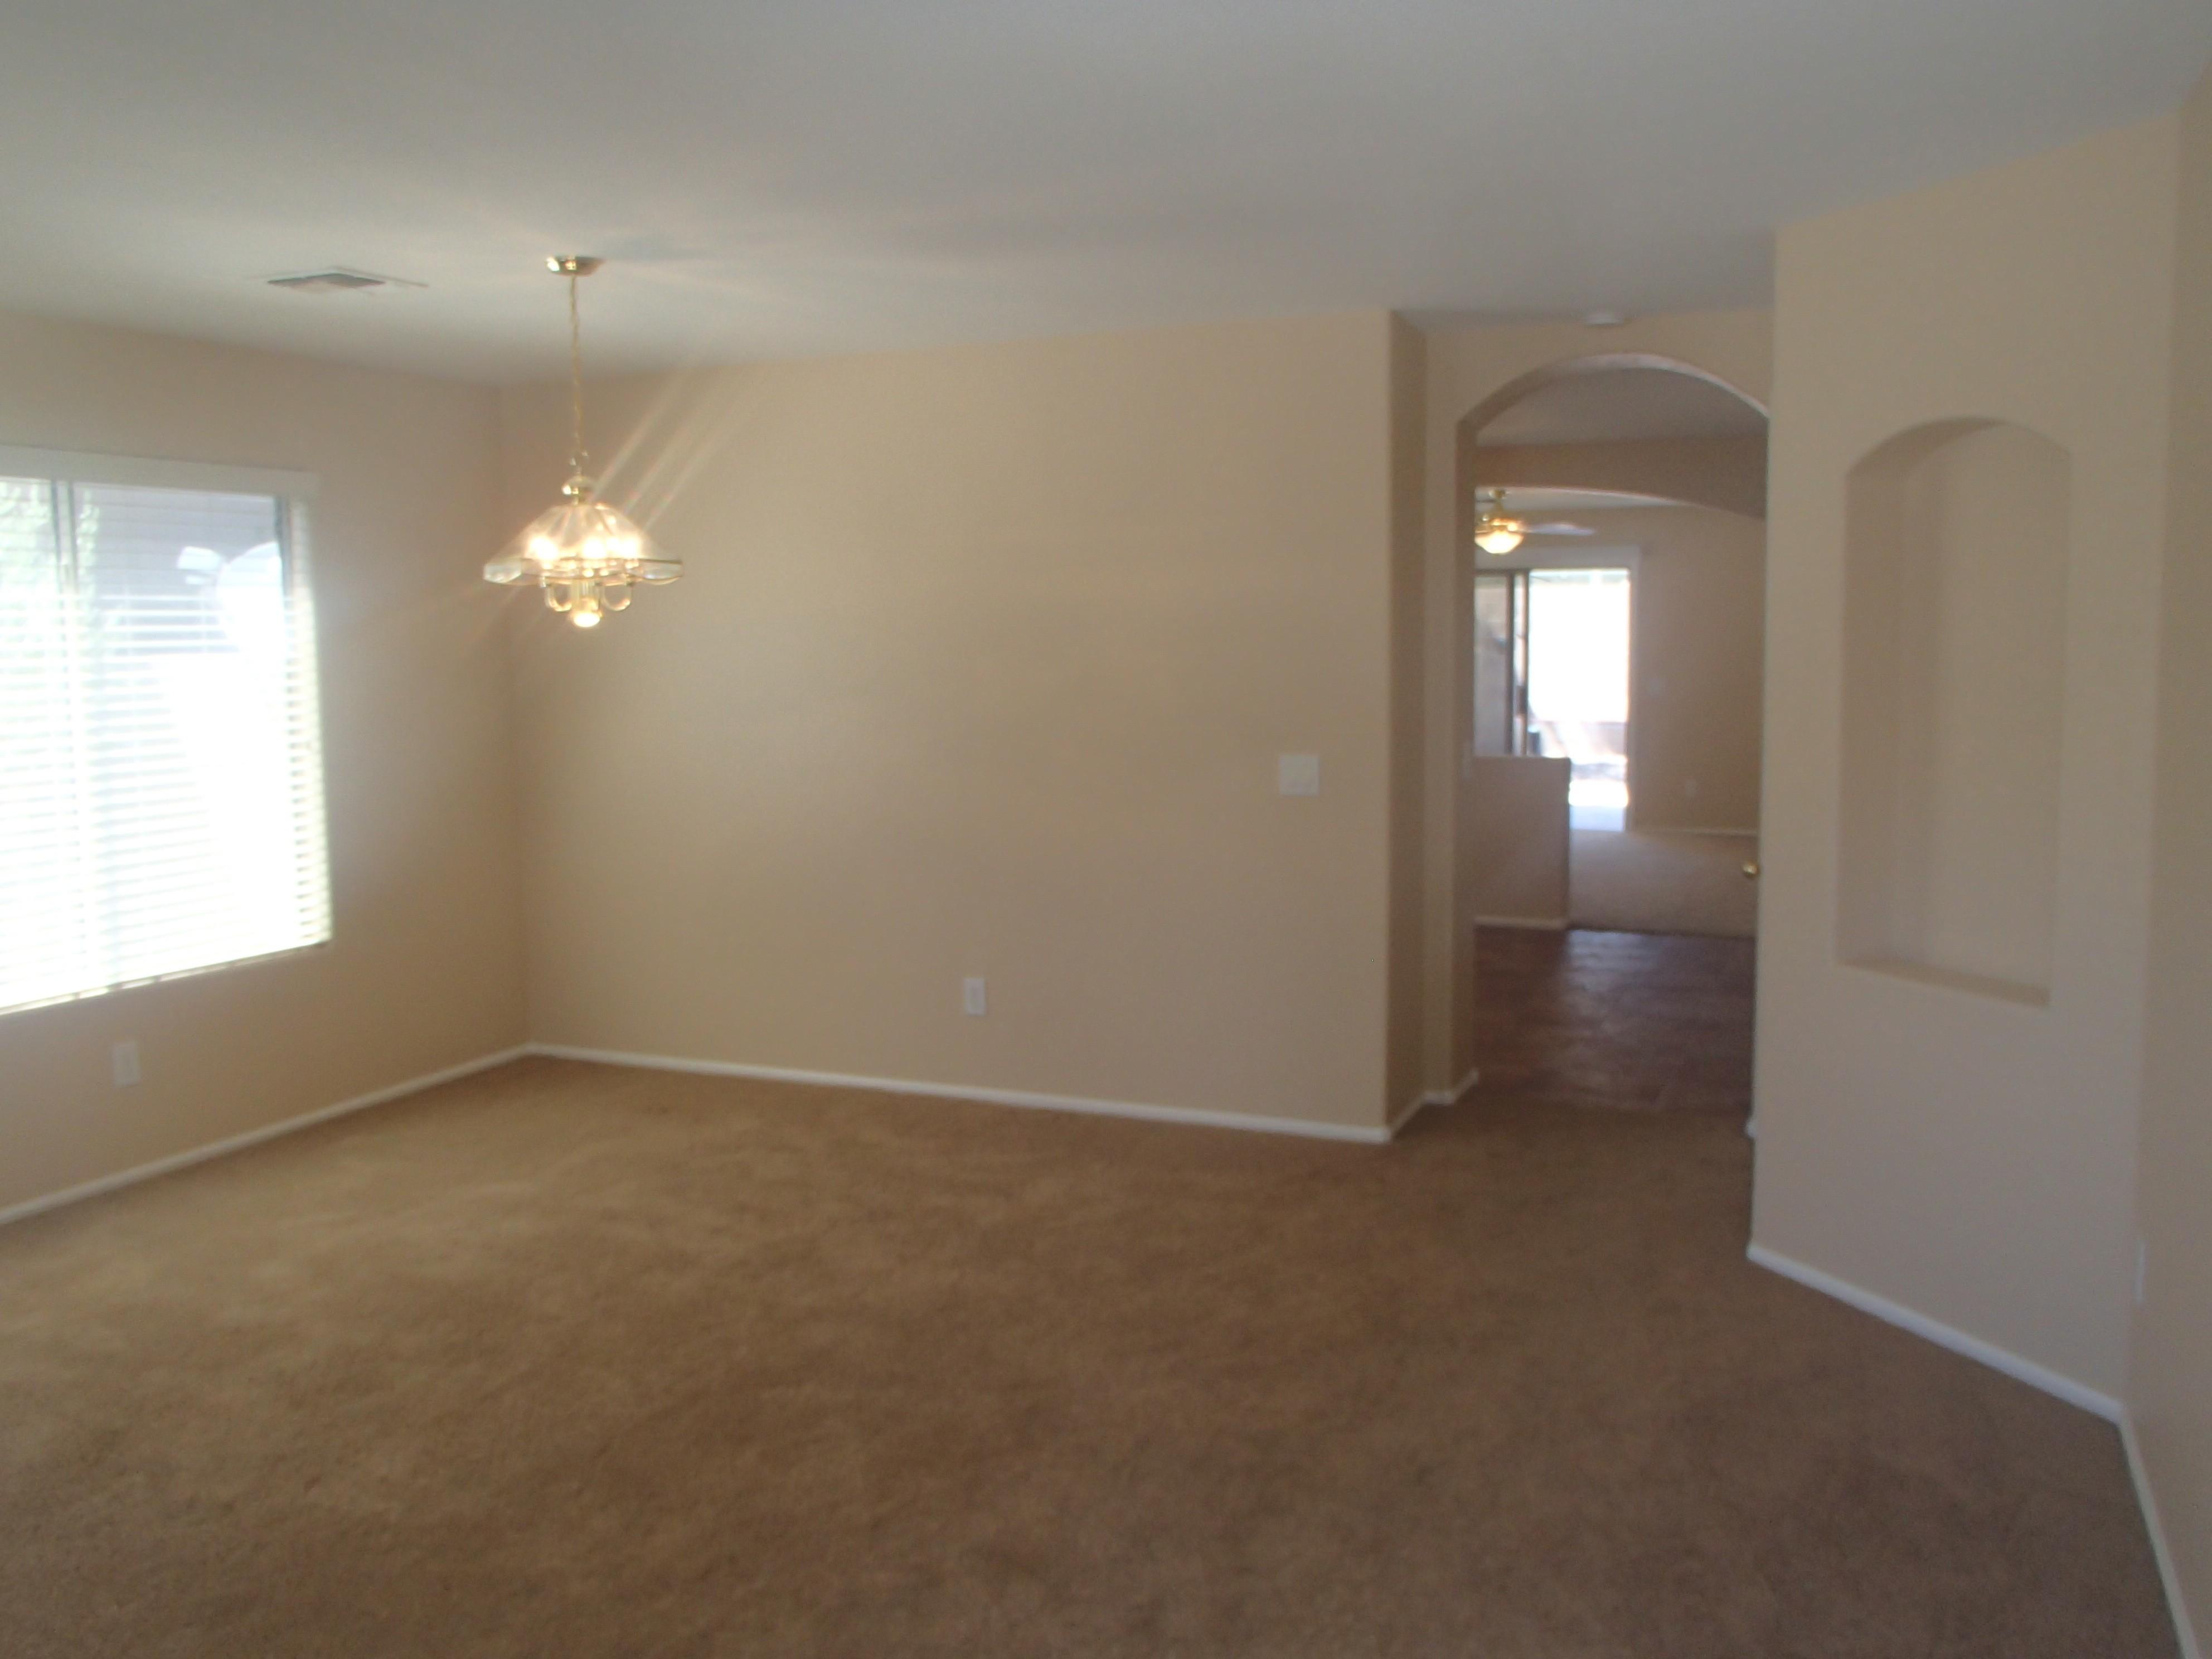 2518 w bent tree dr phoenix az 85085 3 bedroom apartment for rent